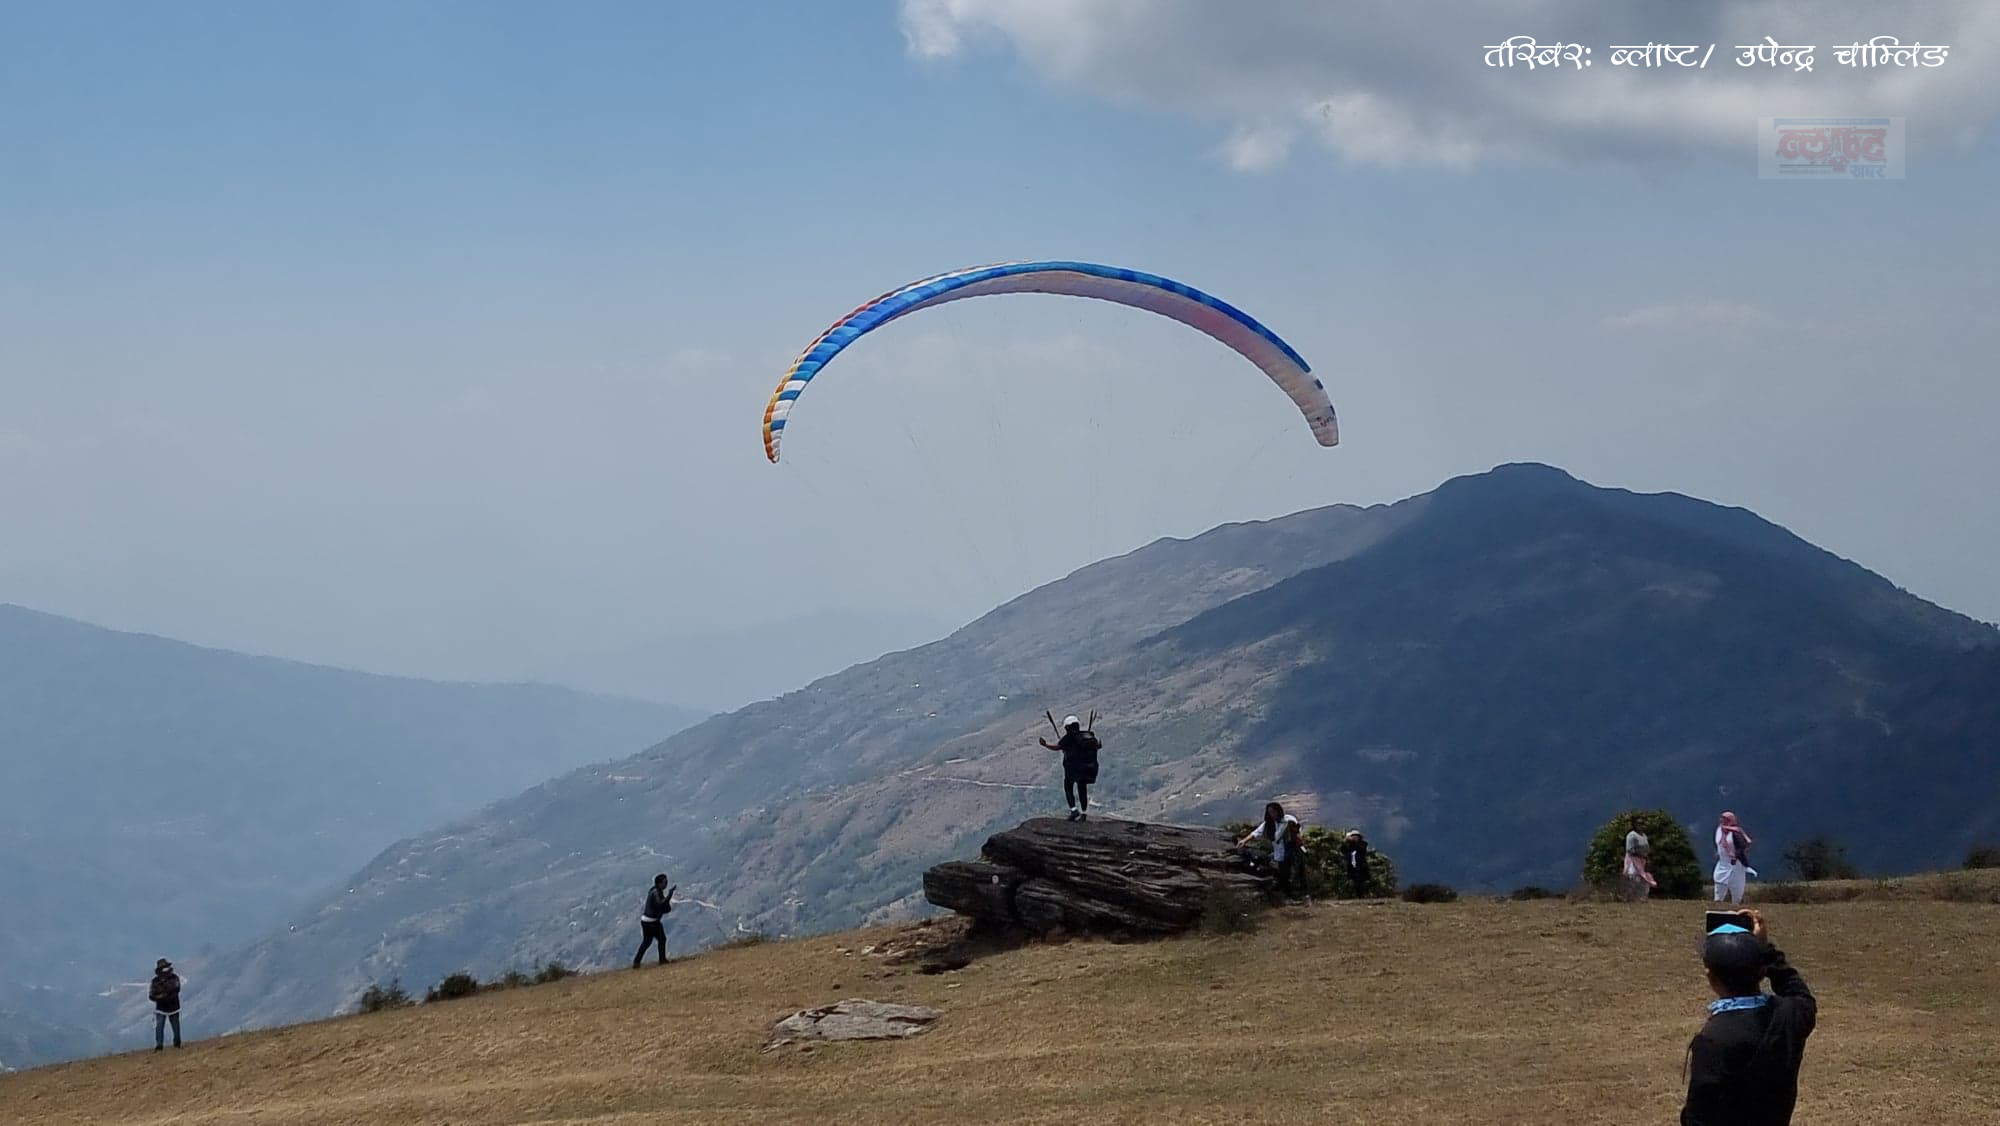 lekhmani_Jimi_Adventure_Park_Upendra_Chamling_Photo2